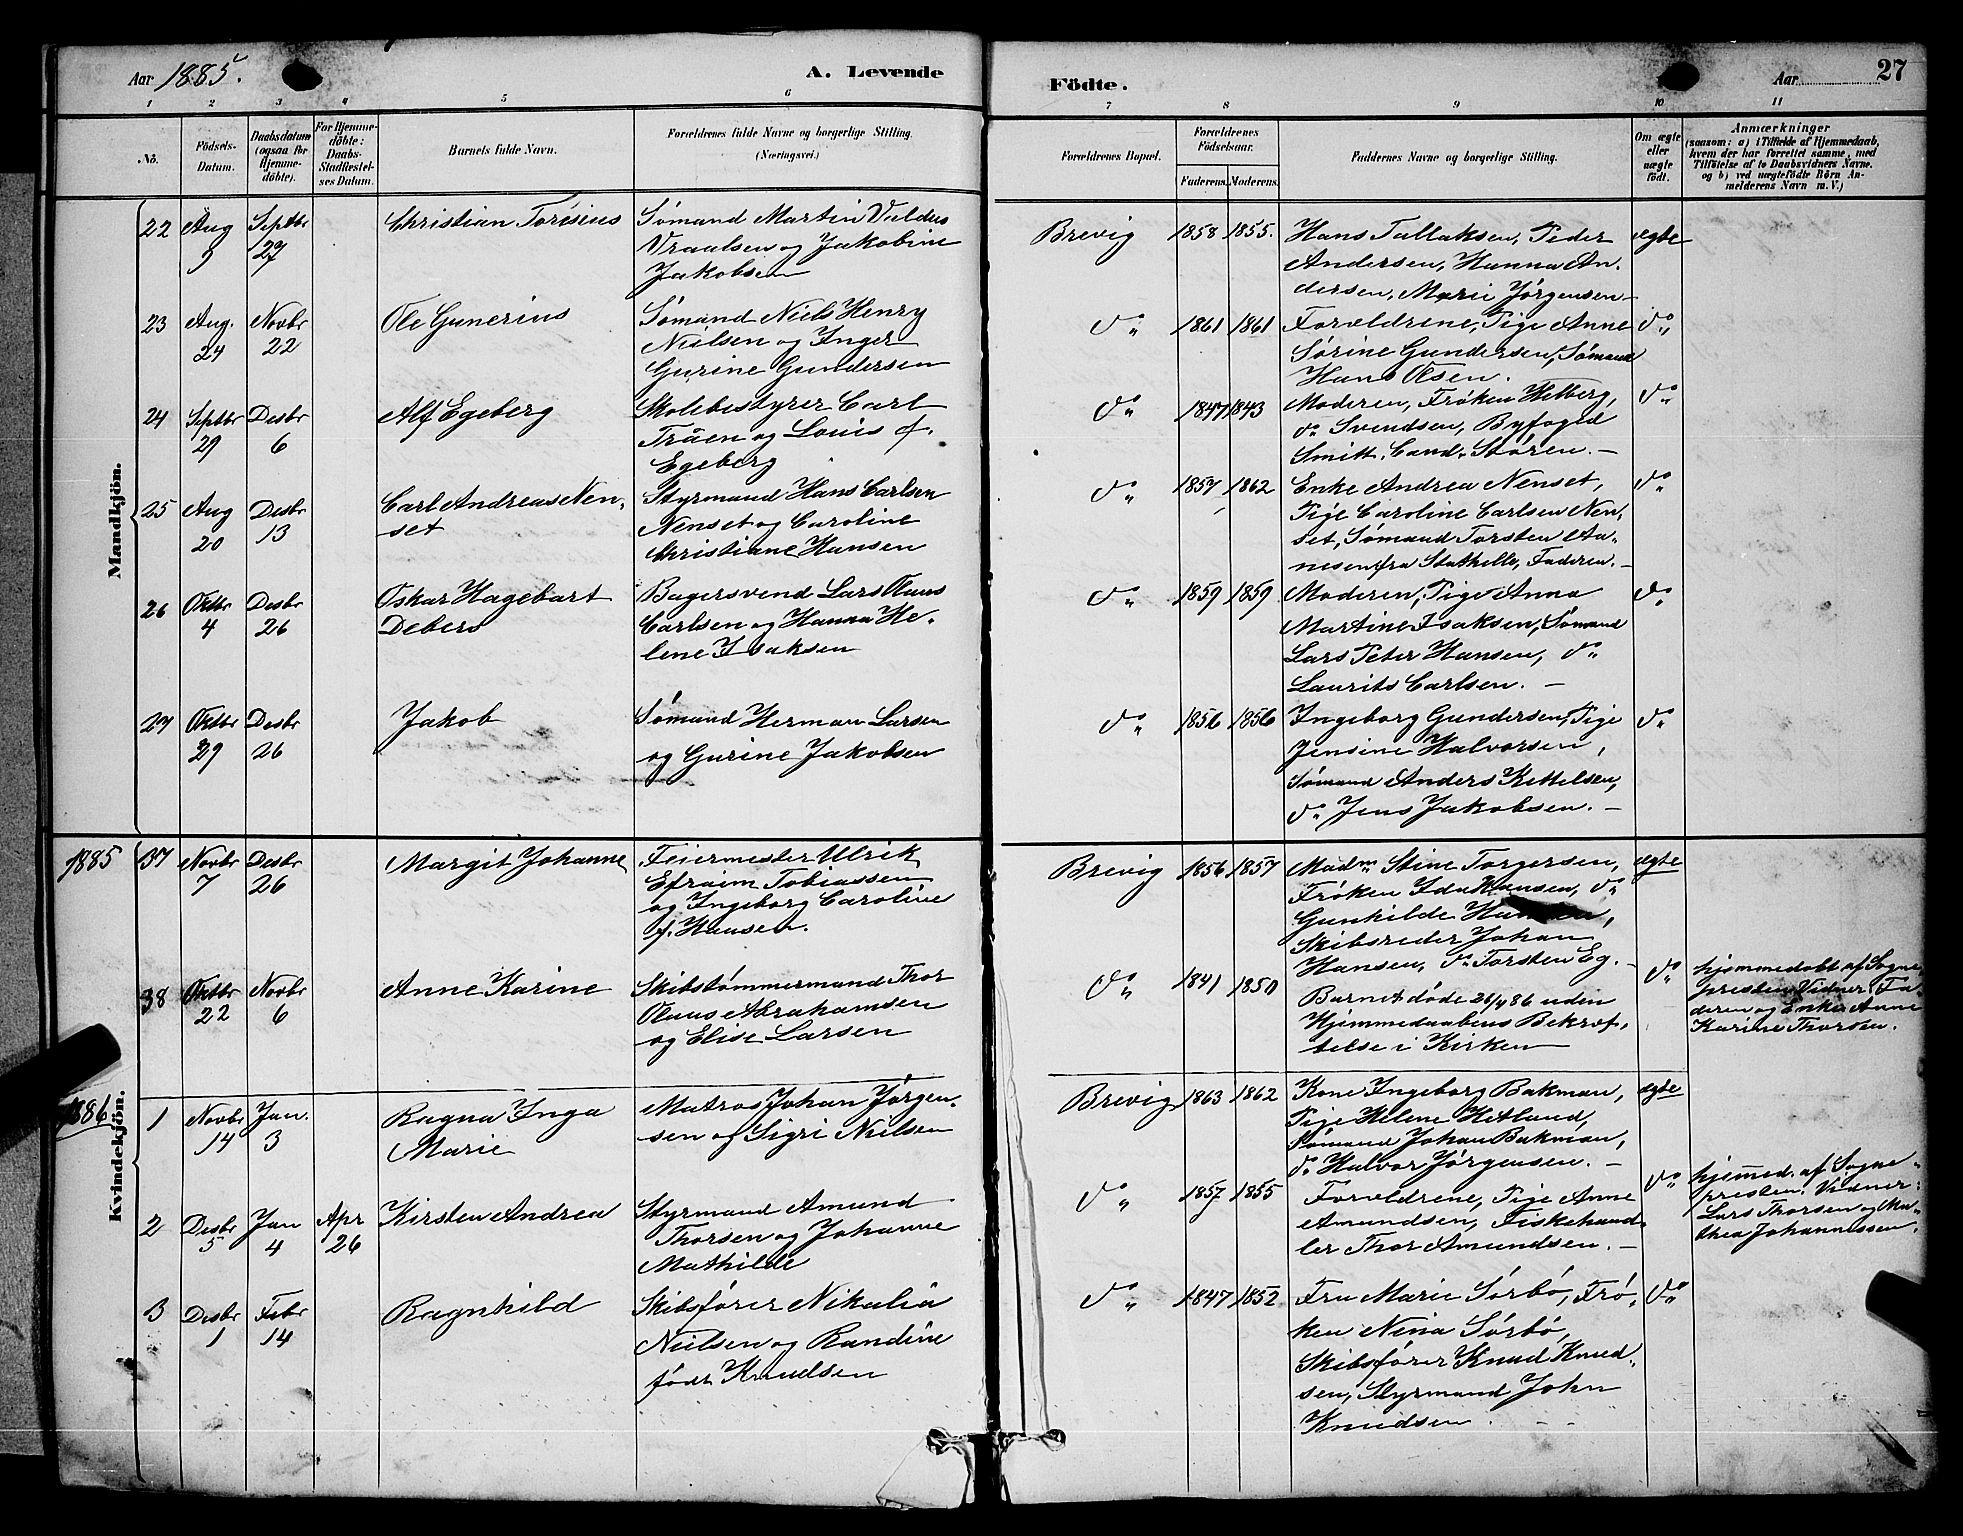 SAKO, Brevik kirkebøker, G/Ga/L0004: Klokkerbok nr. 4, 1882-1900, s. 27